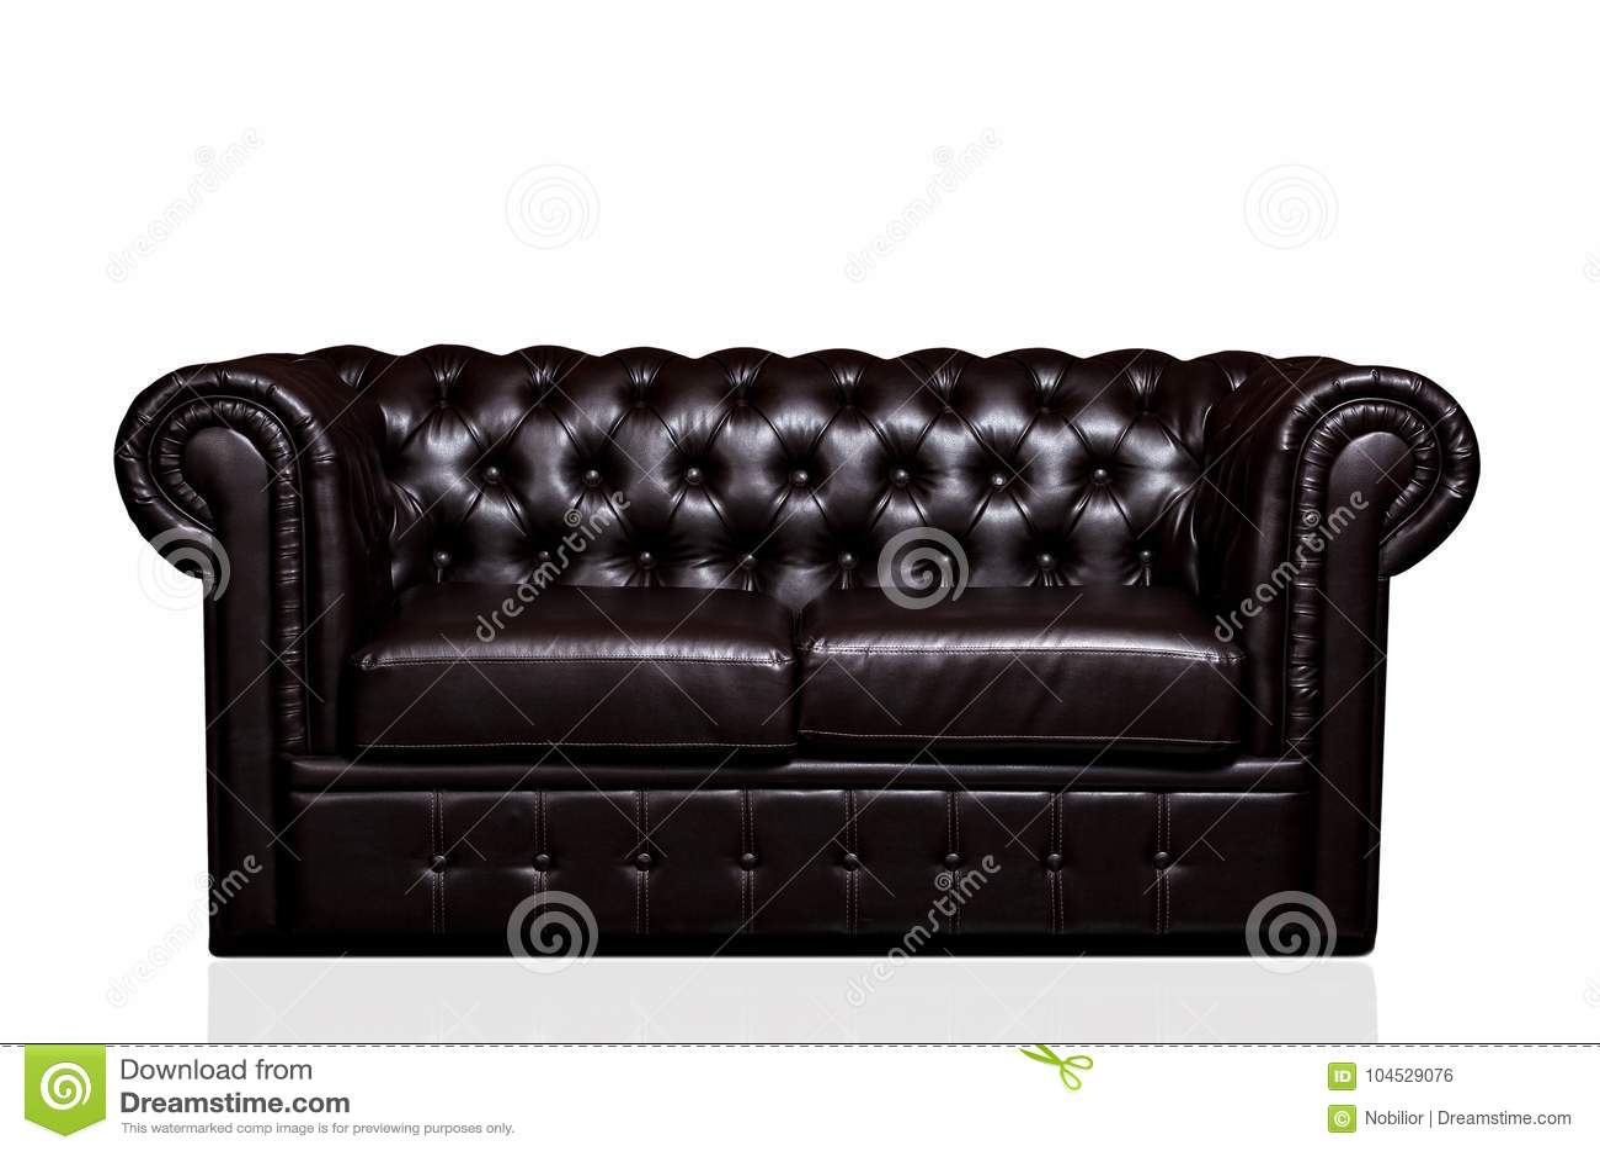 Vintage Old Dark Brown Leather Sofa Stock Photo - Image of ...